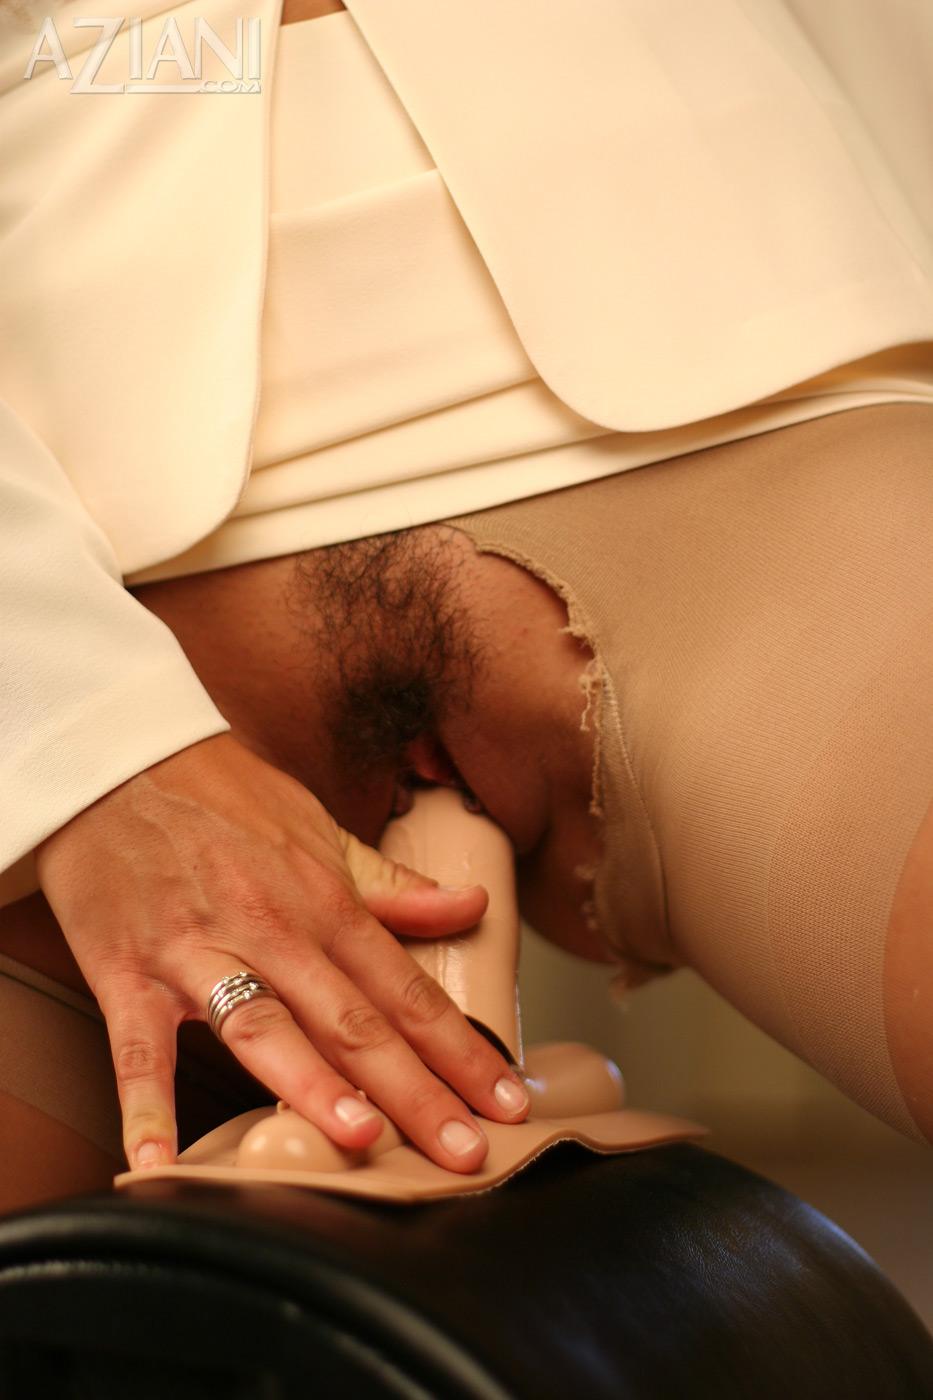 Male mutual hand jobs